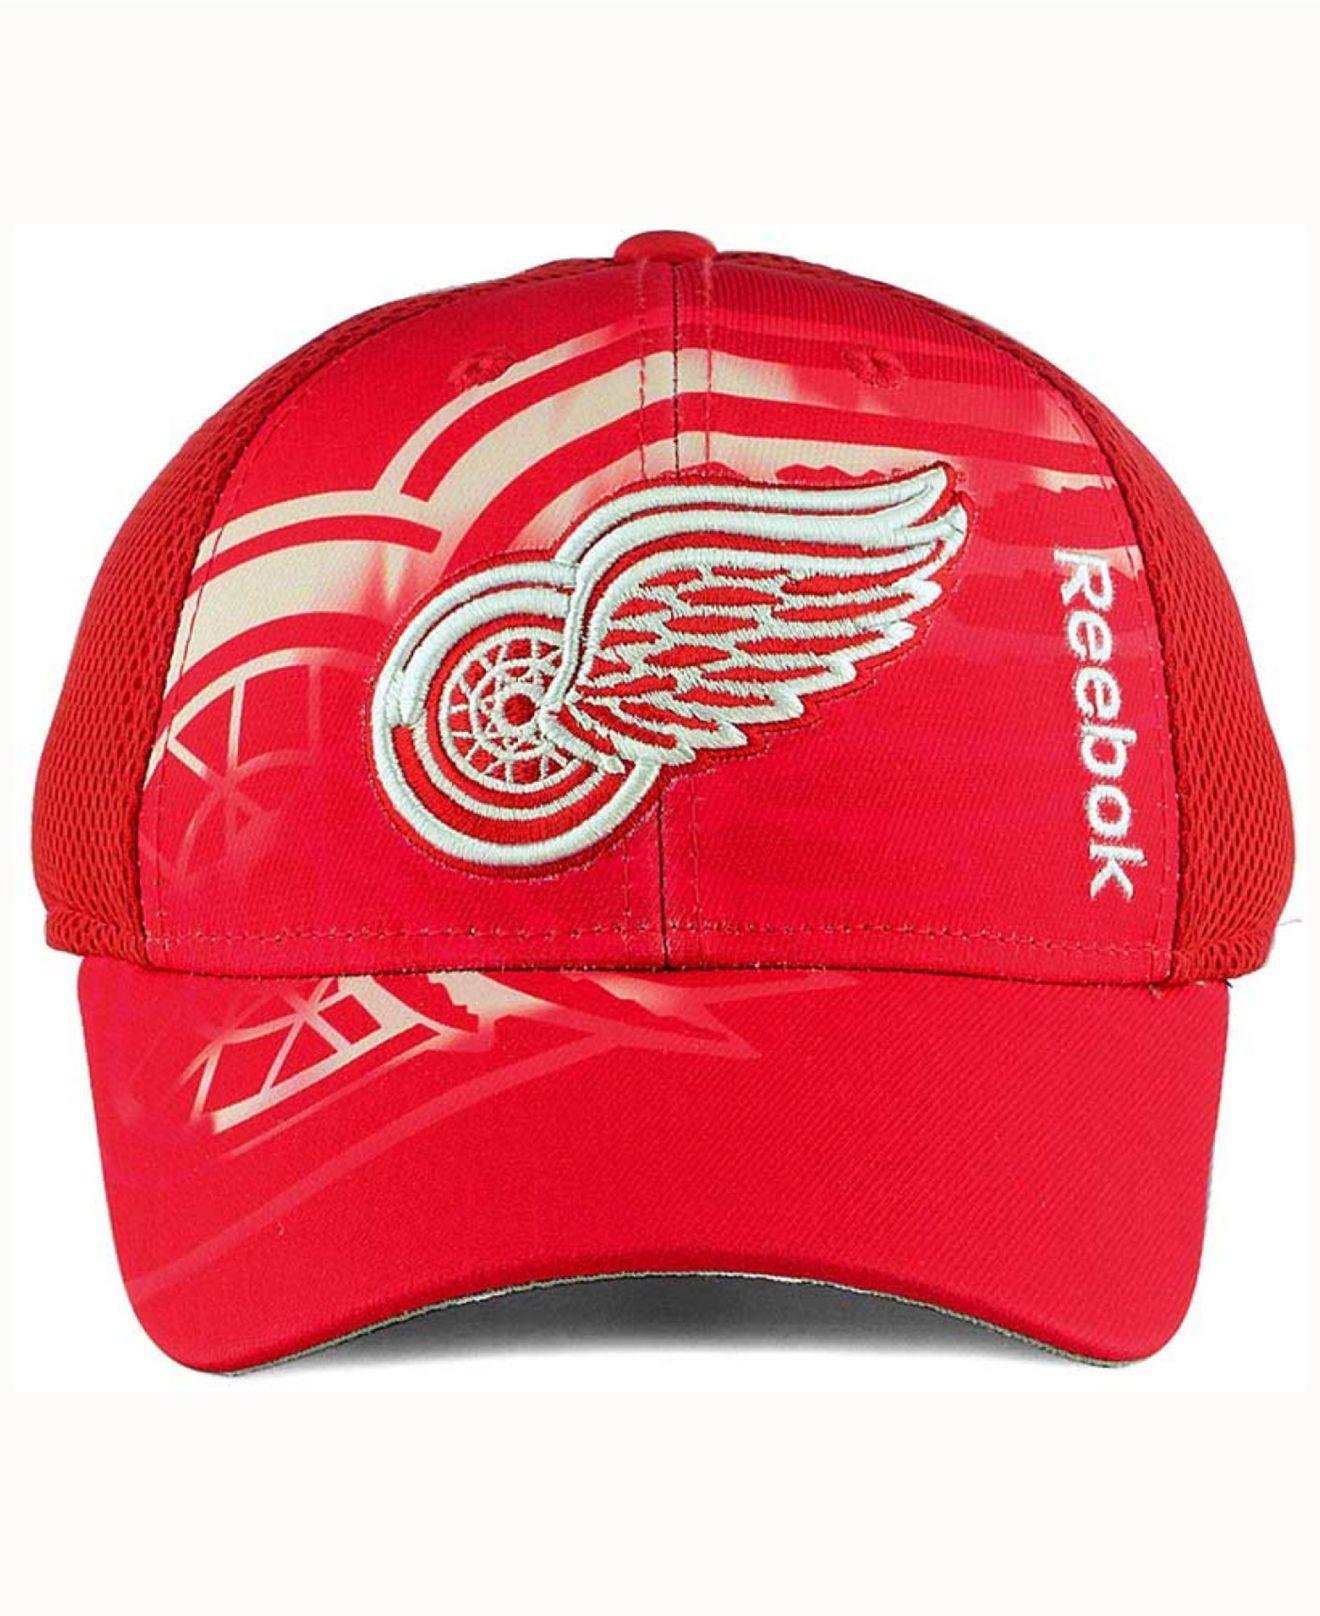 size 40 83235 d1367 ... discount lyst reebok 2nd season flex cap in red for men 44be8 be9f5